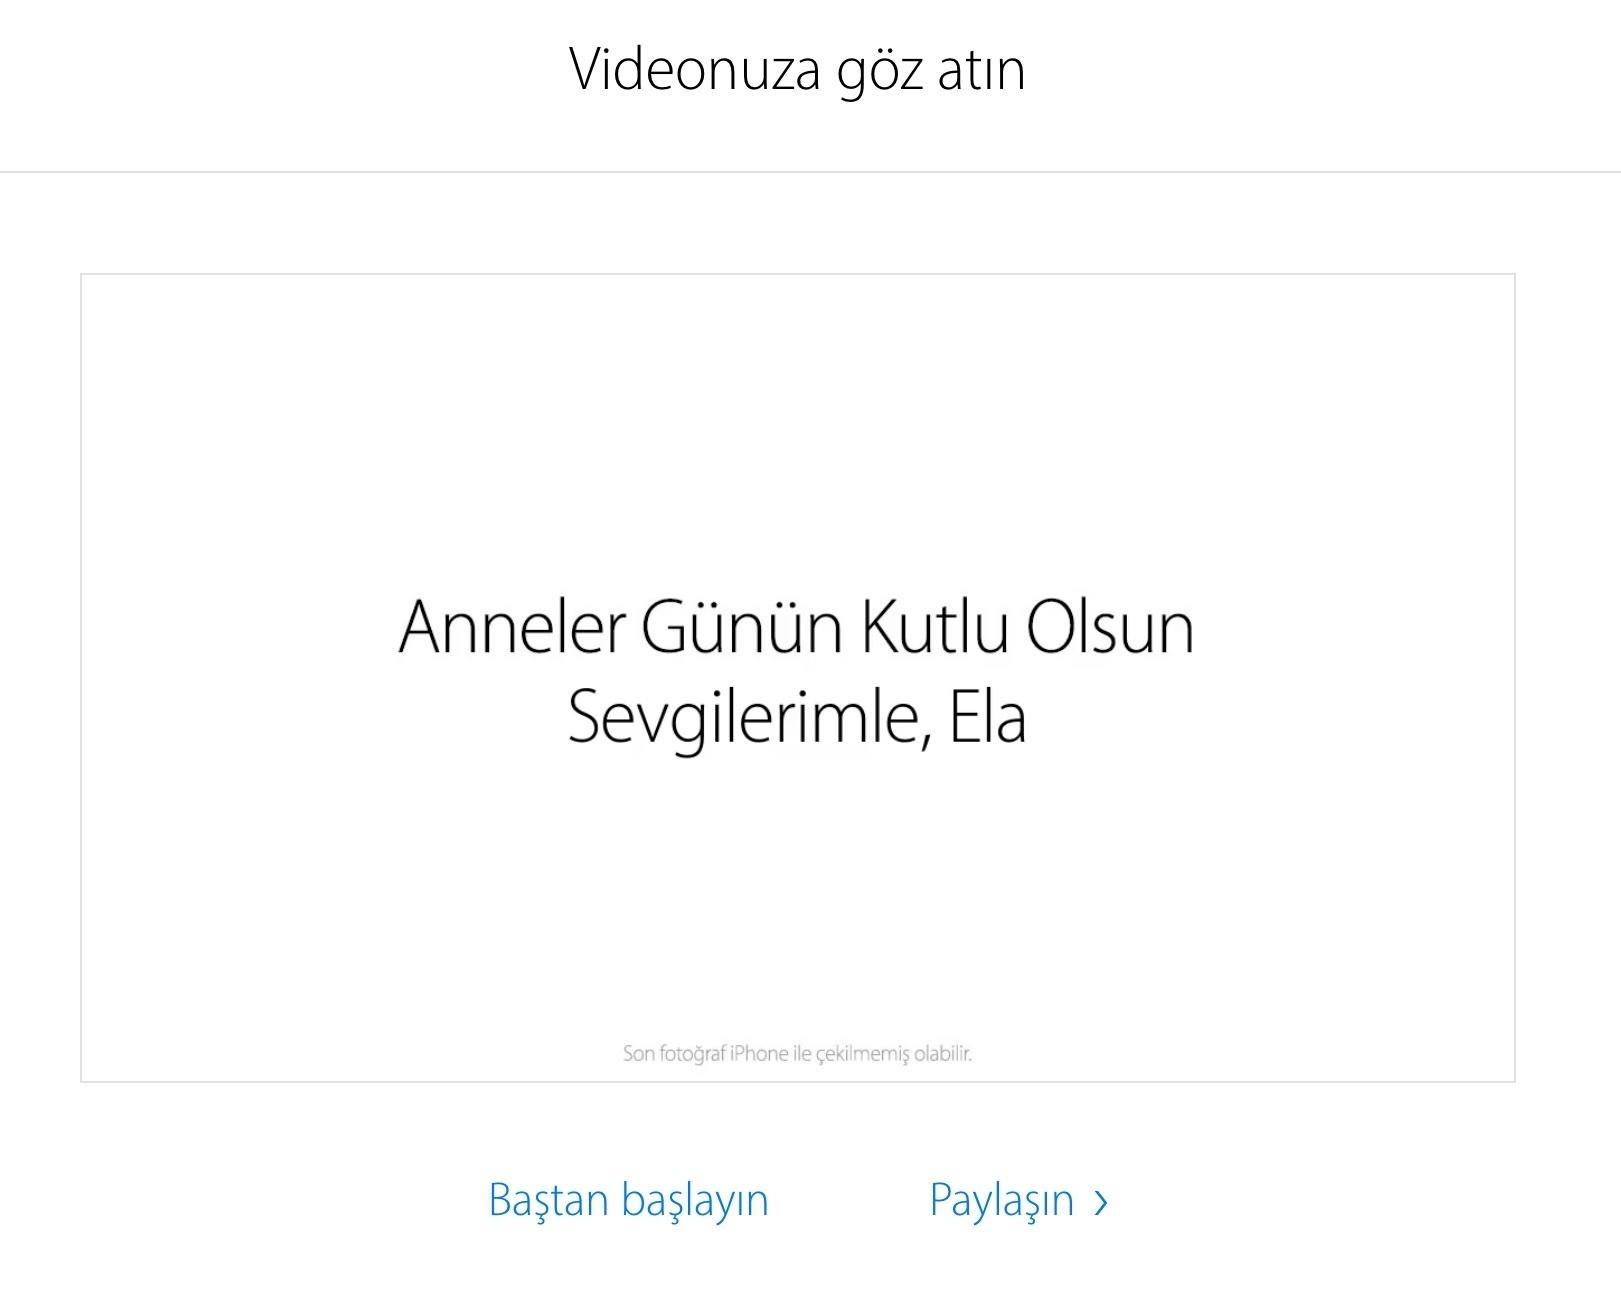 apple-anneler-gunu-video-070516-2